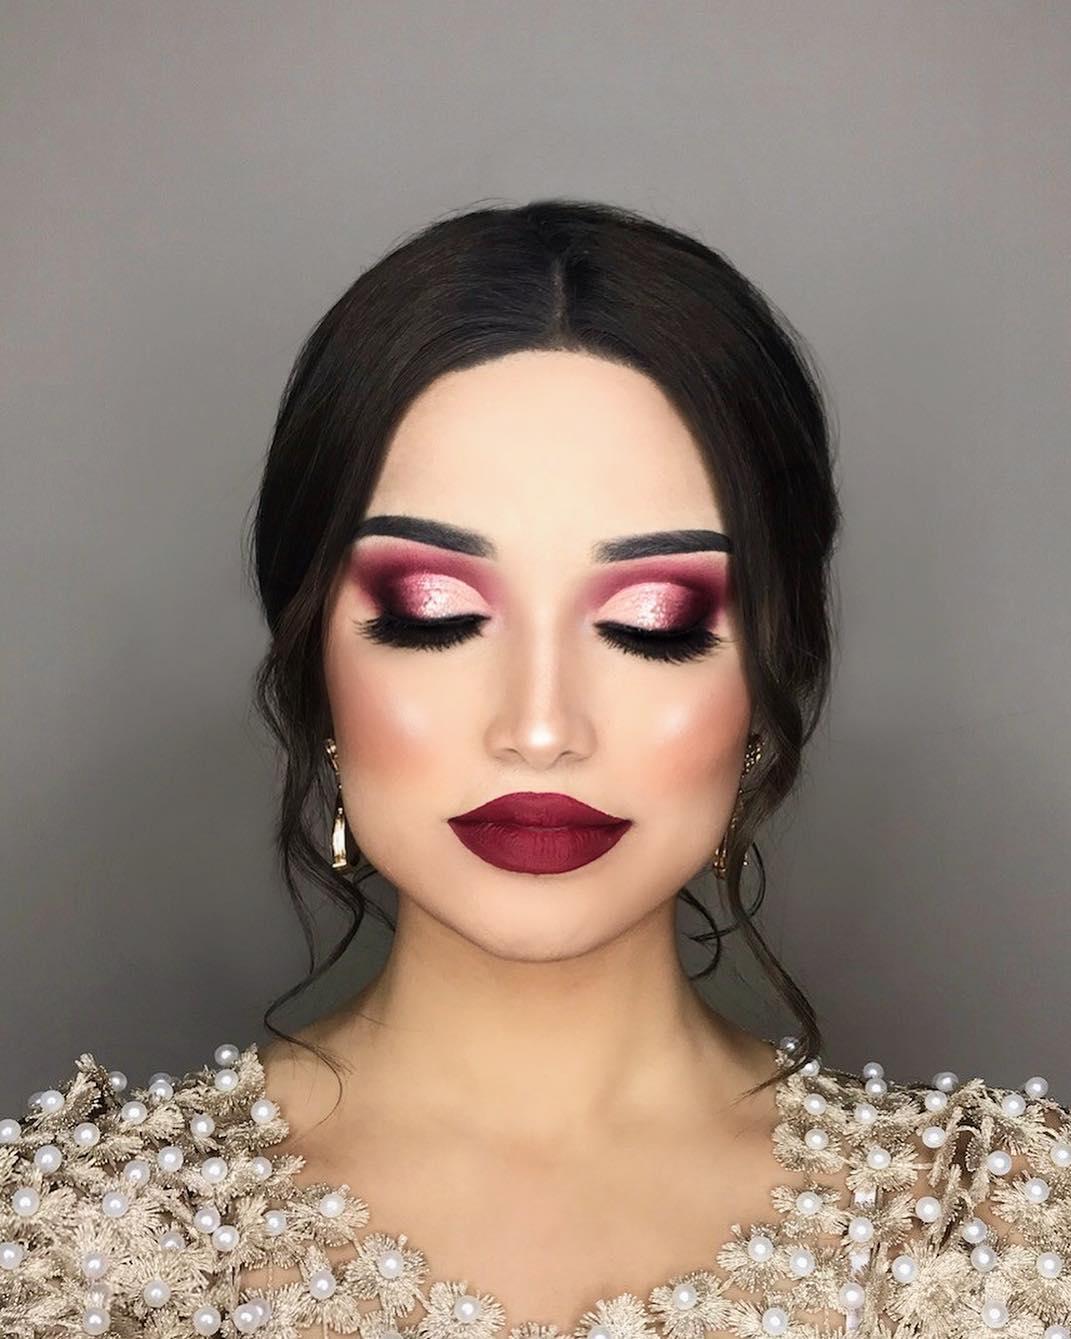 красивые идеи макияжа 2019 фото 20